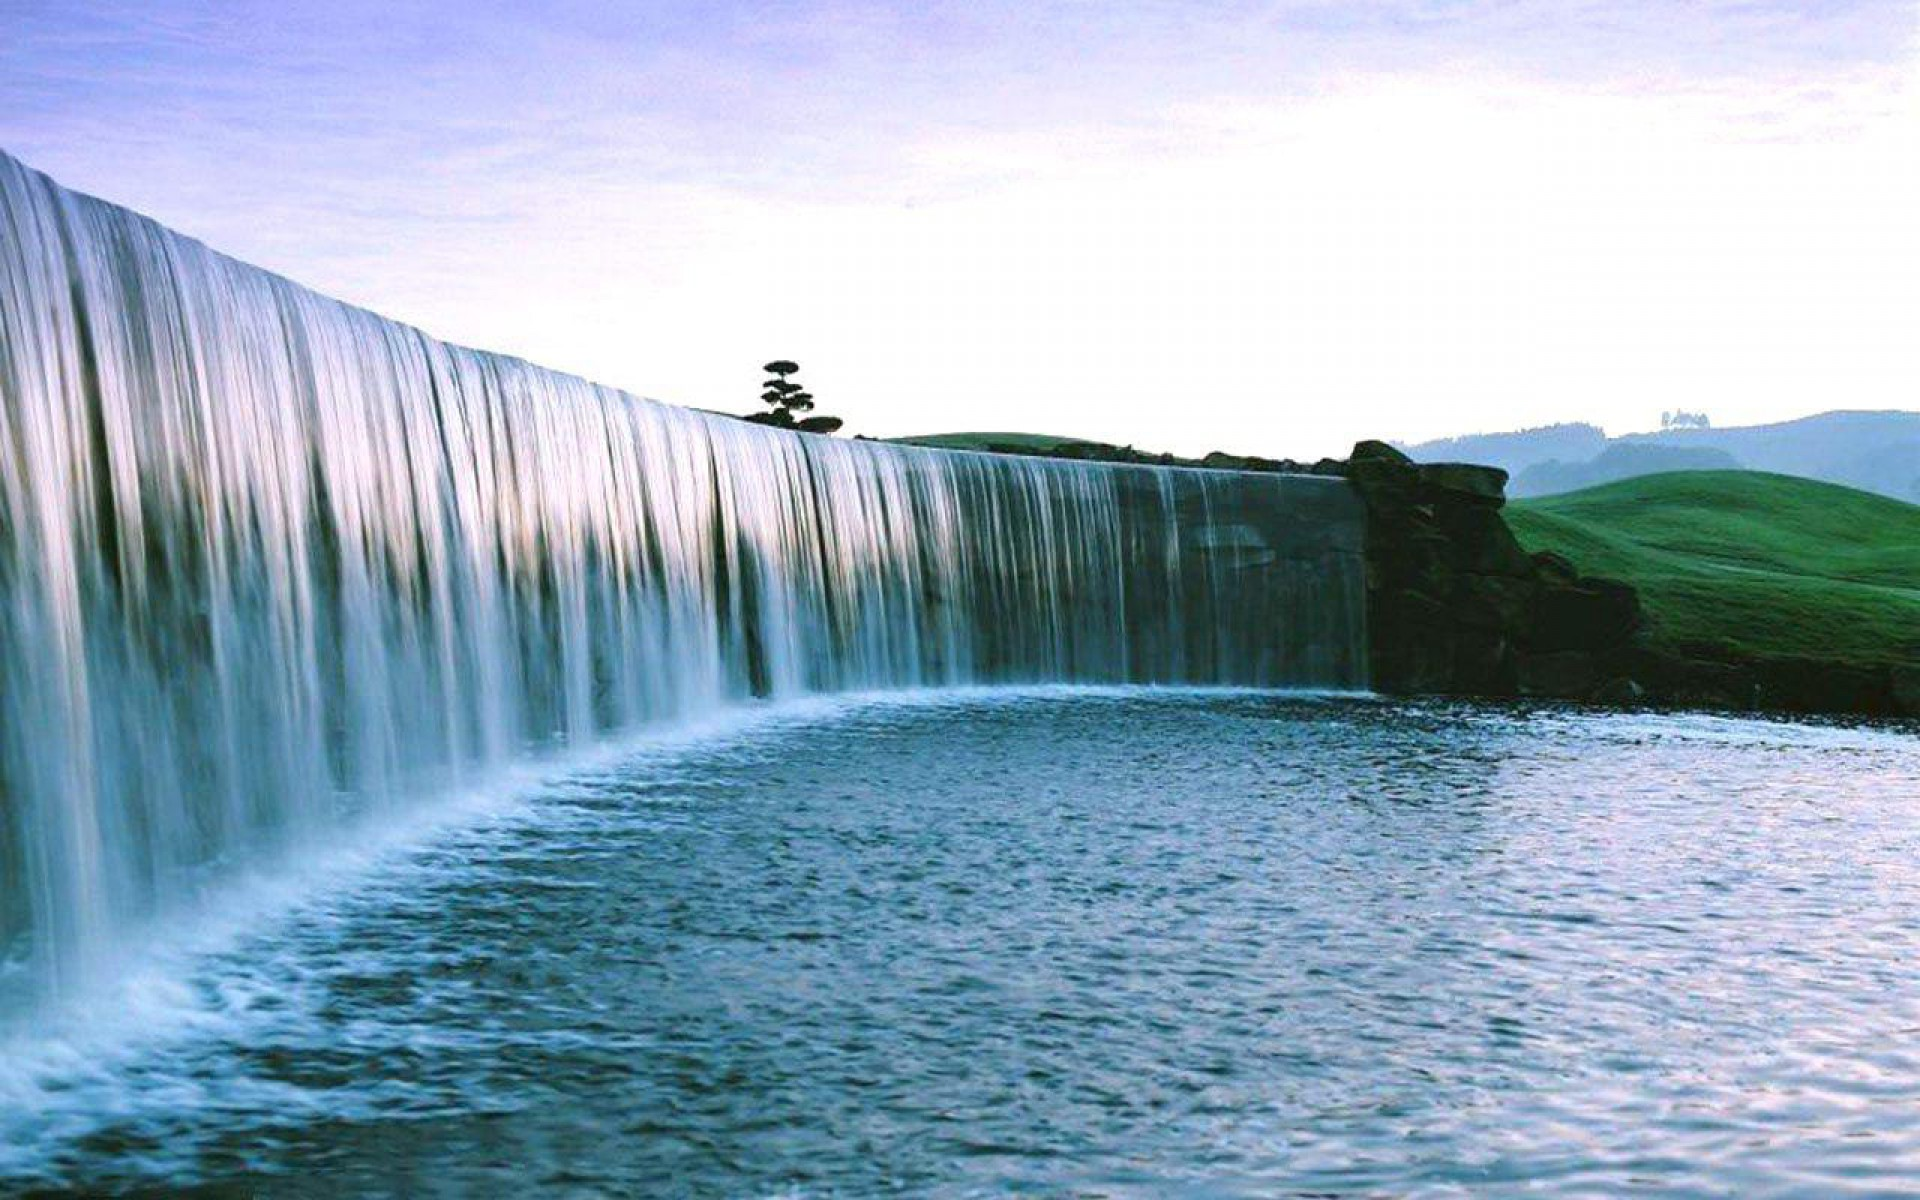 Full Screen Waterfall Wallpaper Hd Nature - HD Wallpaper